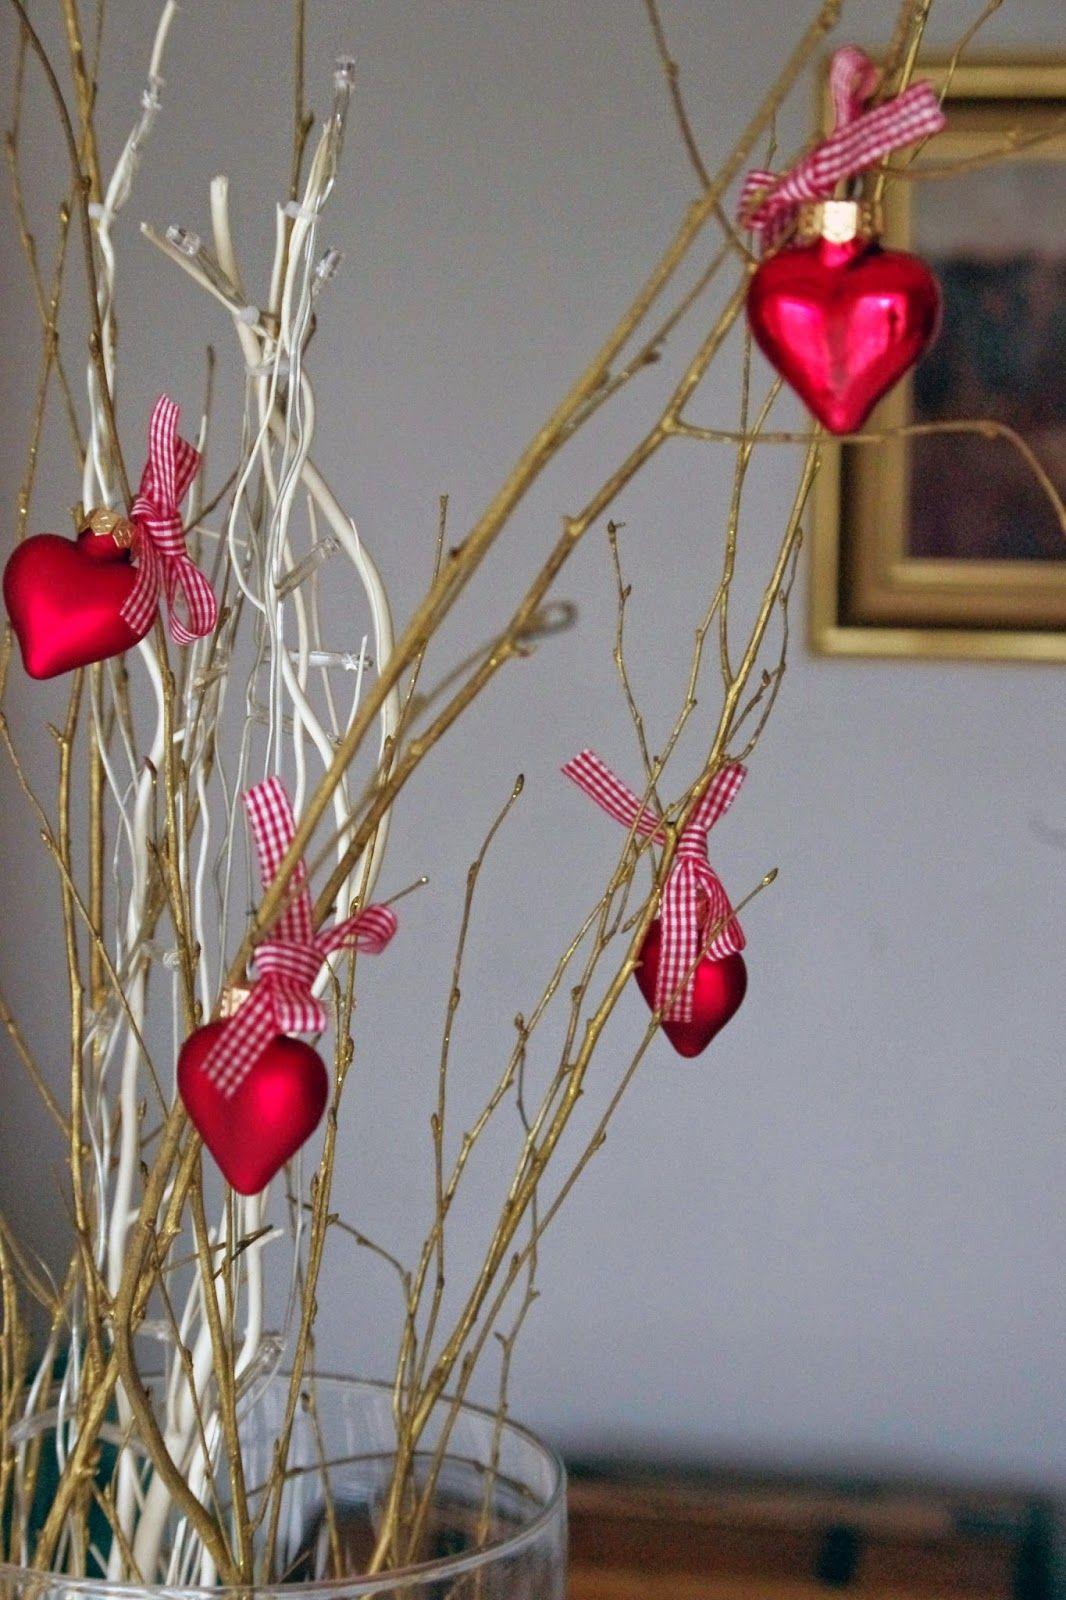 Valentine's table centerpiece